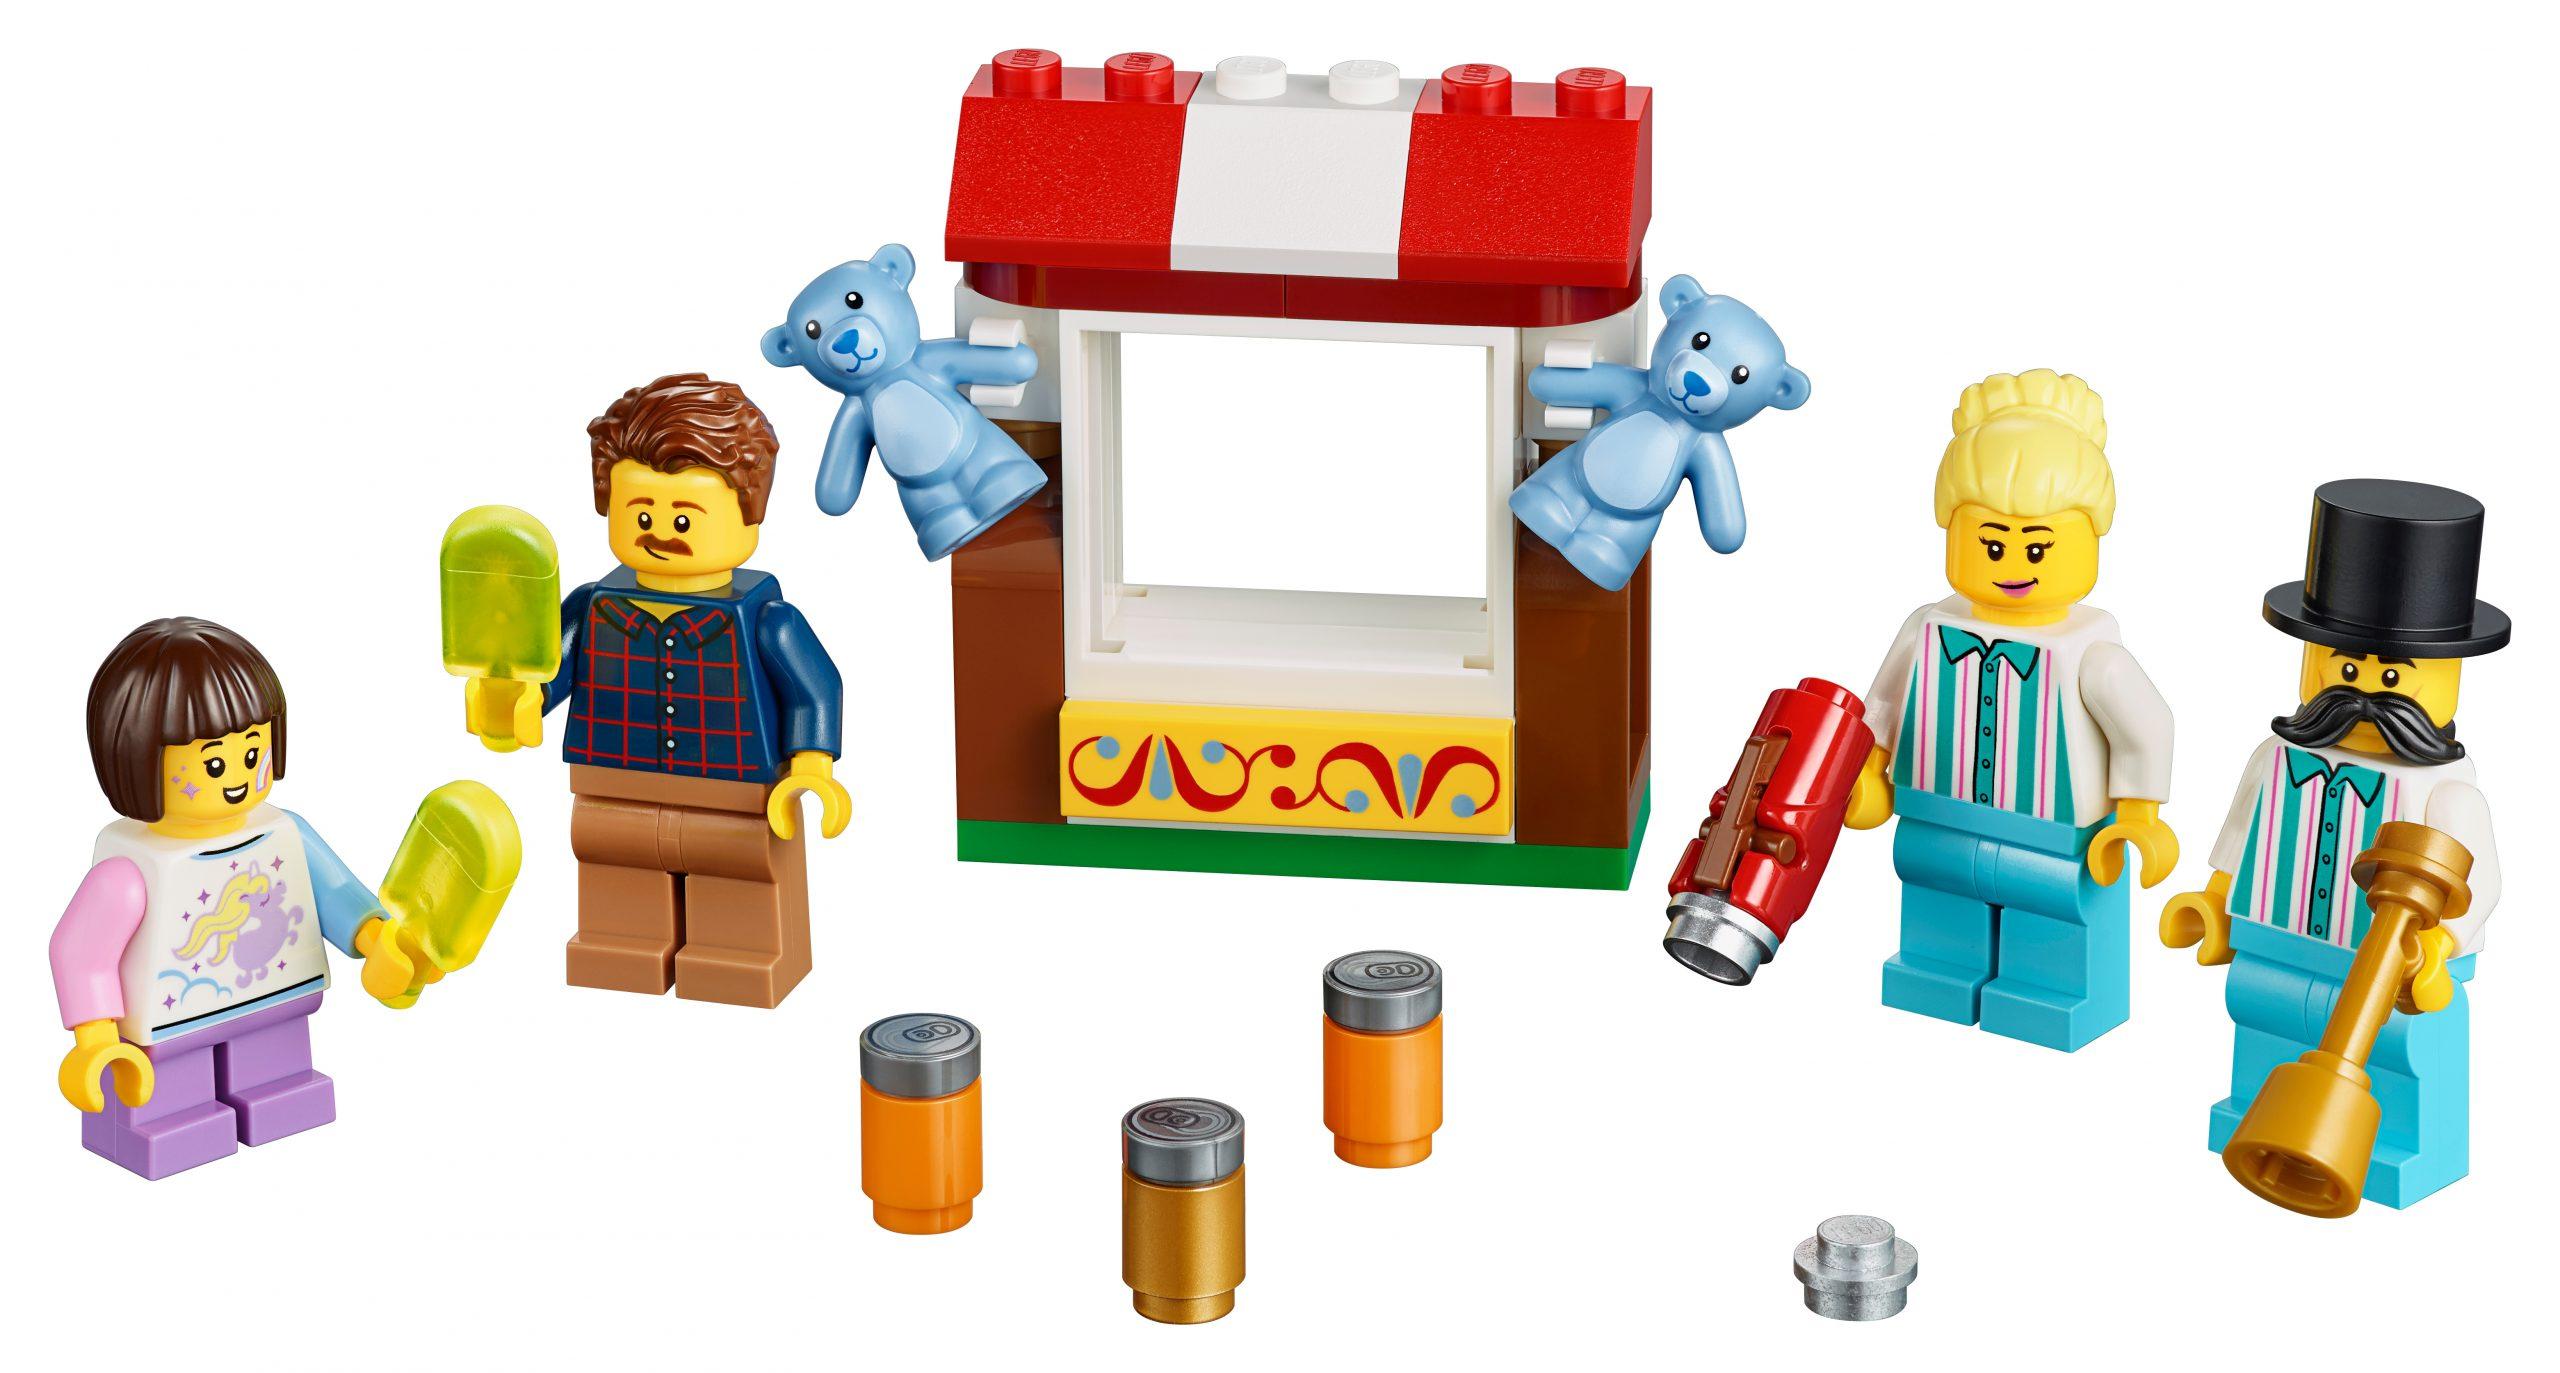 lego kermis mf accessoireset 40373 scaled